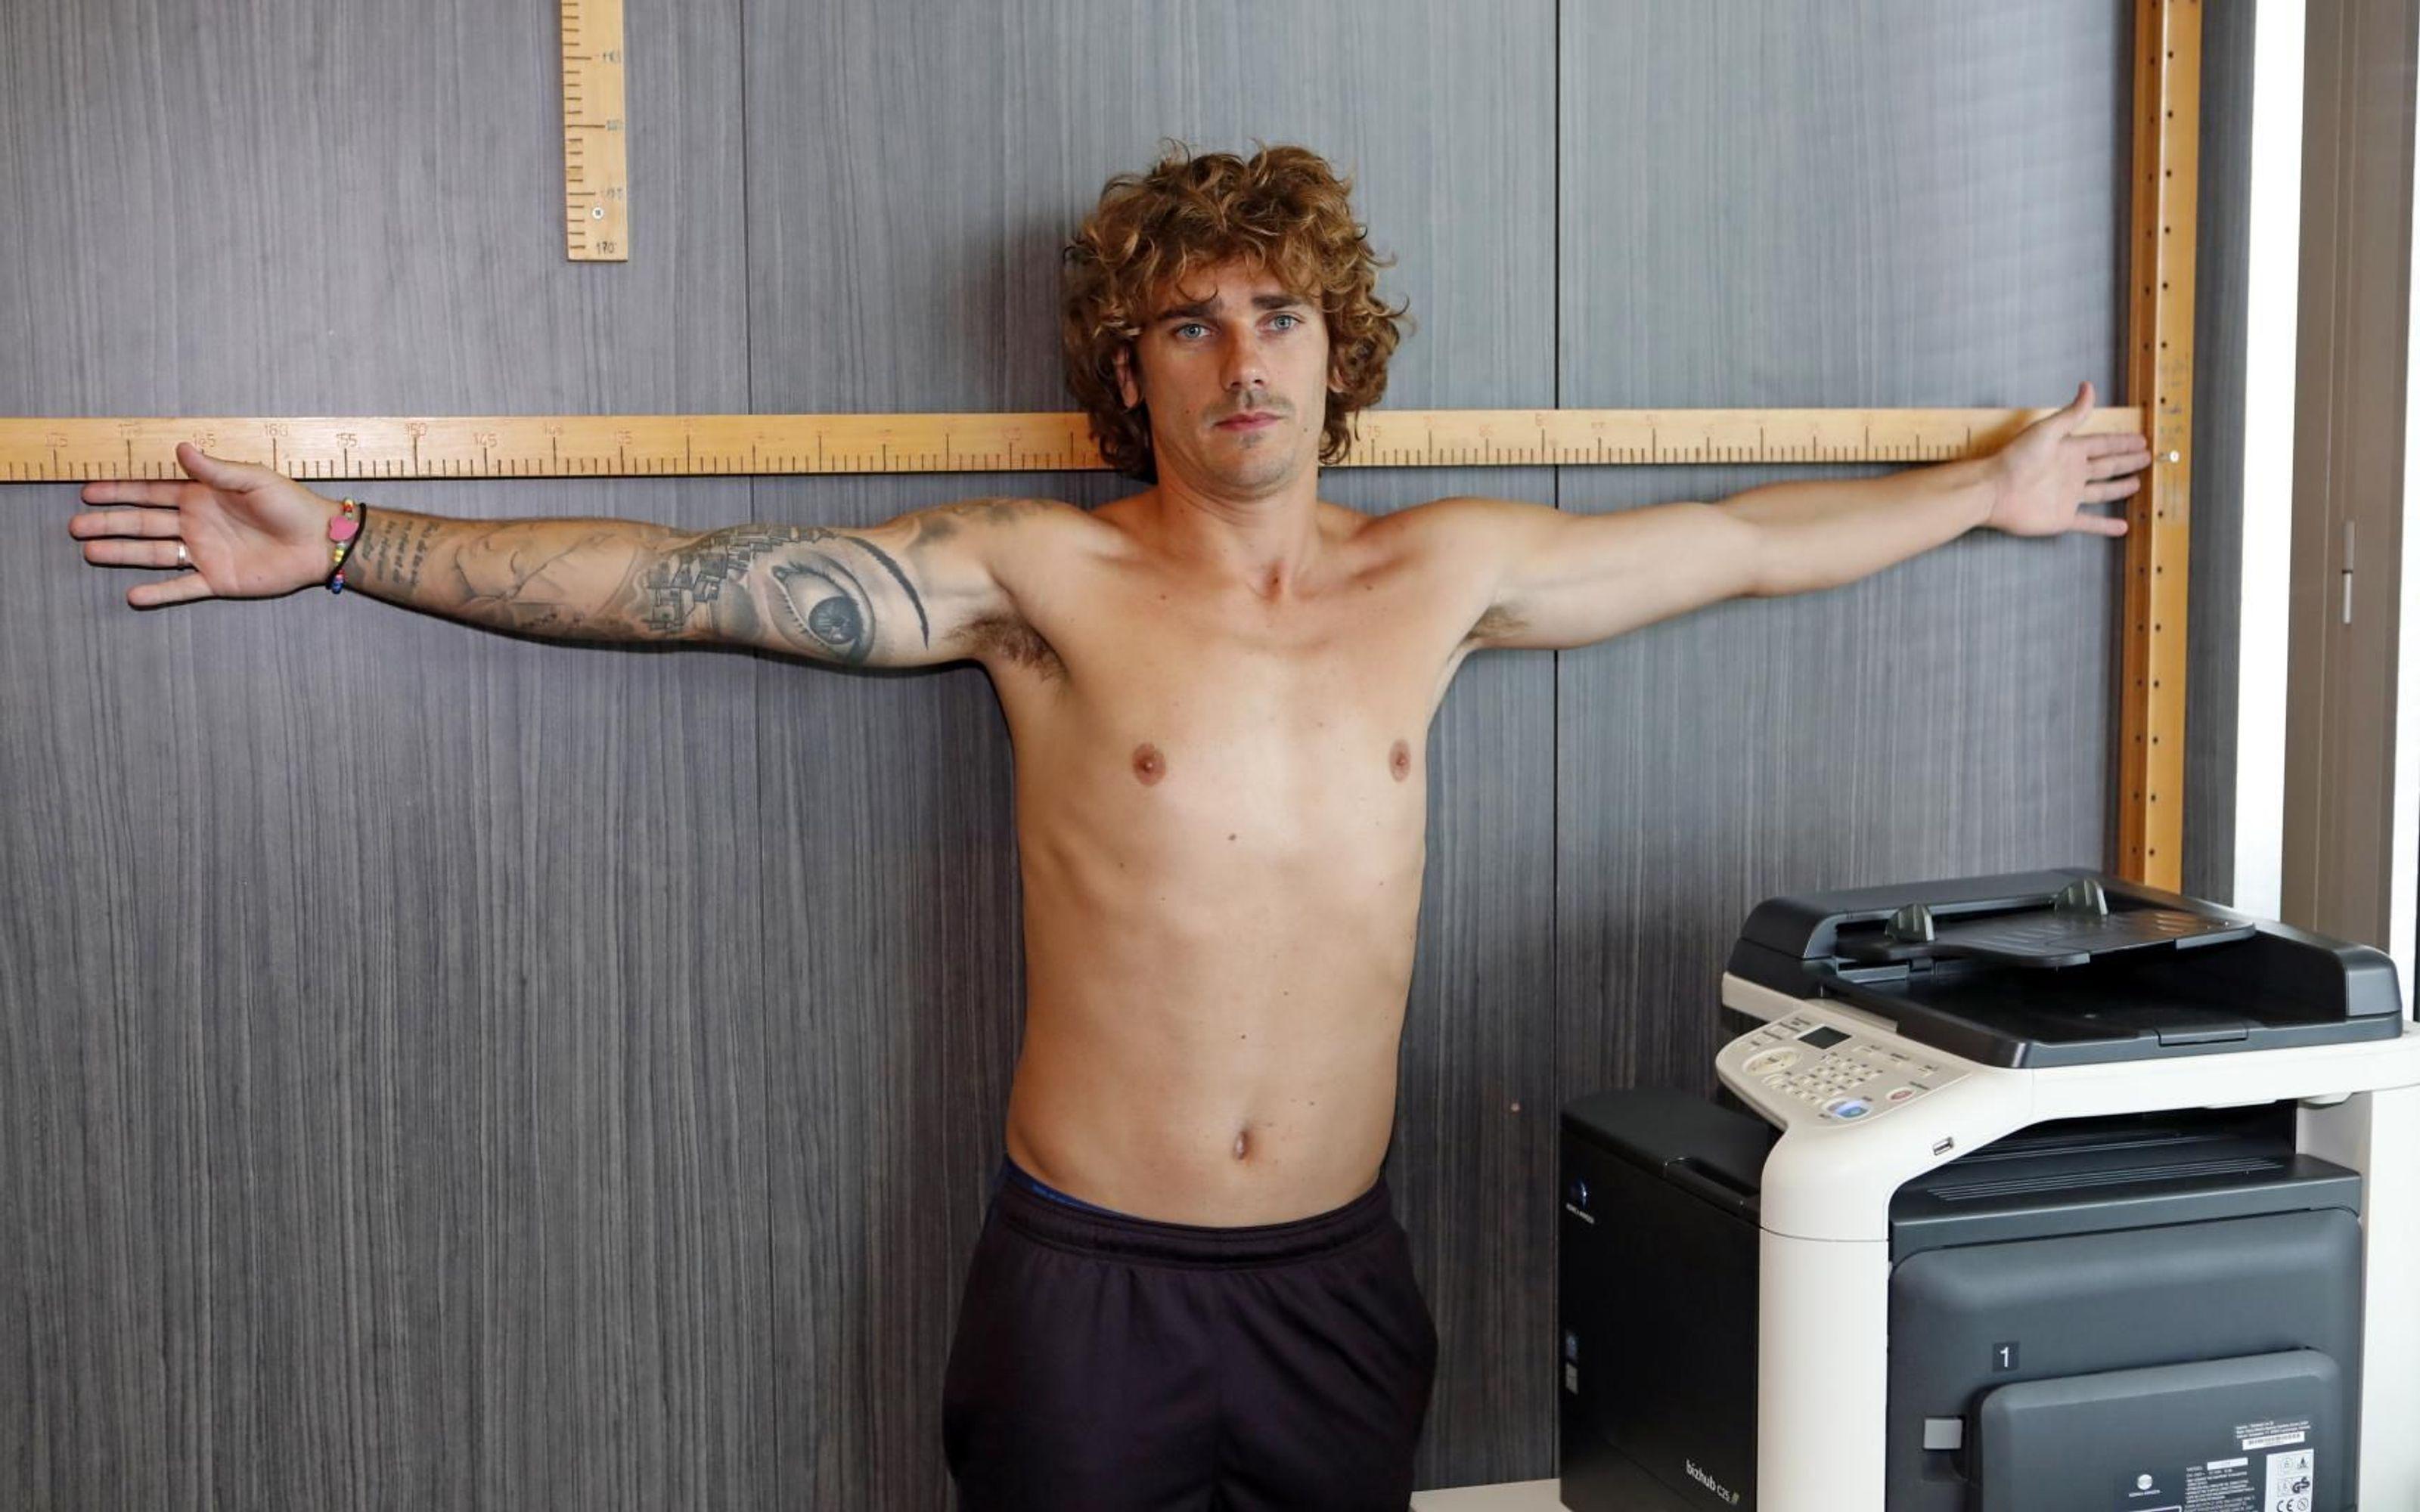 ¿Cuánto mide Antoine Griezmann? - Altura - Real height - Página 10 Mini_2019-07-14-PRUEBAS-FISICAS-GRIEZMANN-03